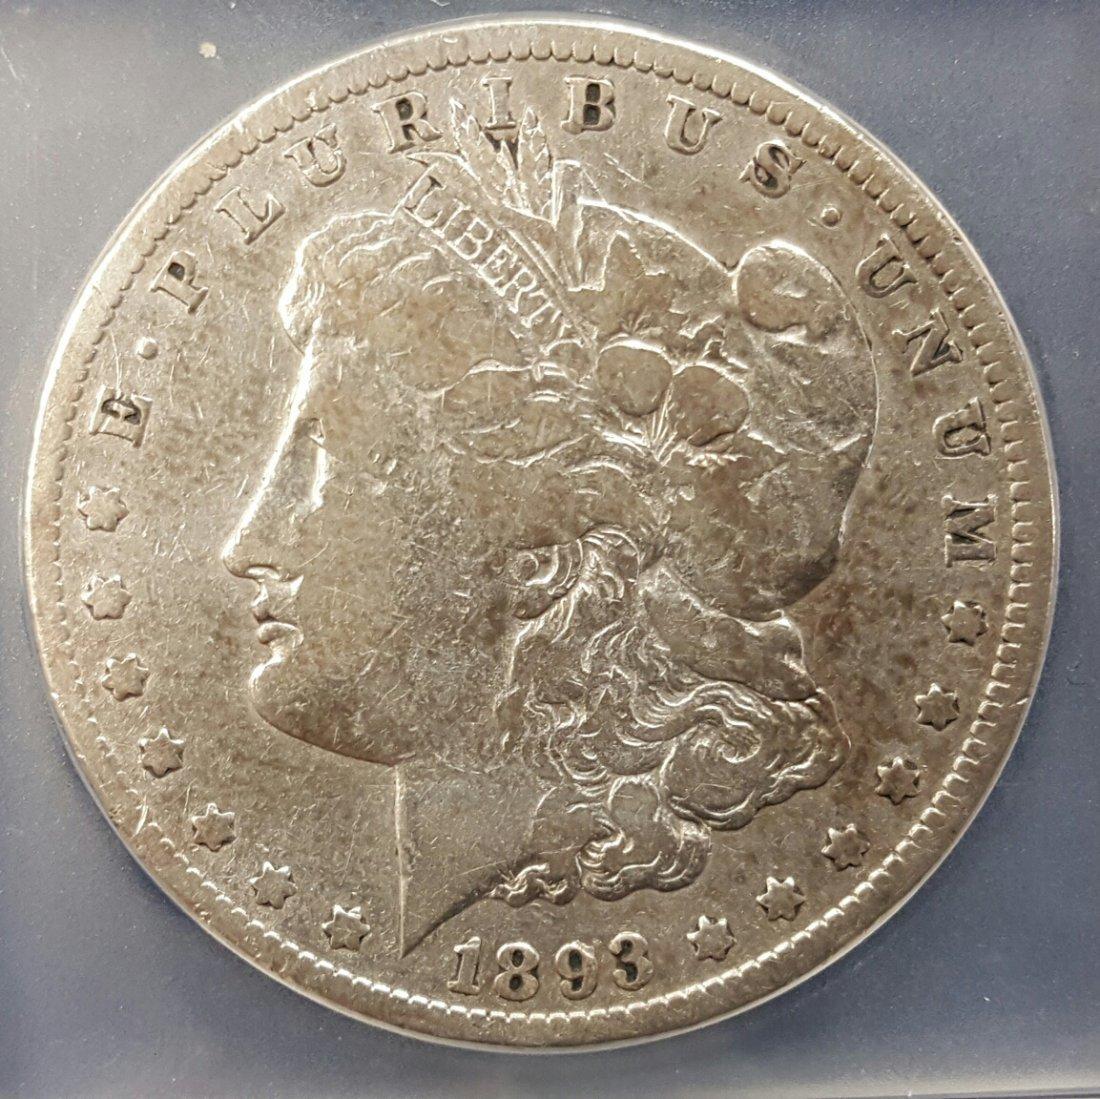 1893 Carson City Silver Dollar (last year)